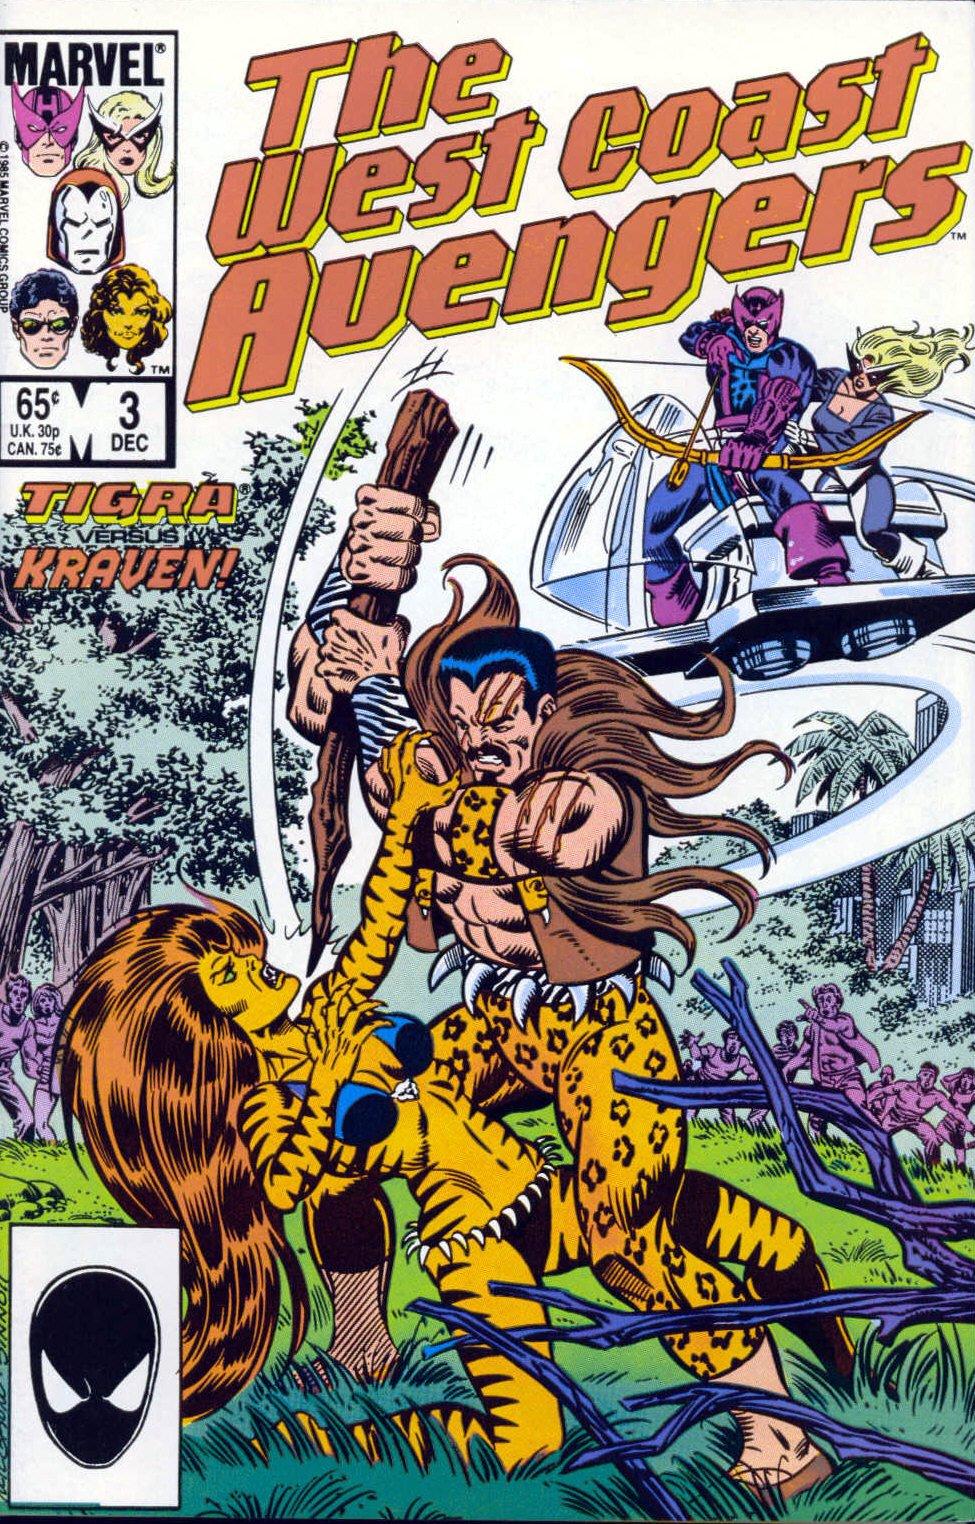 West Coast Avengers (1985) 3 Page 1